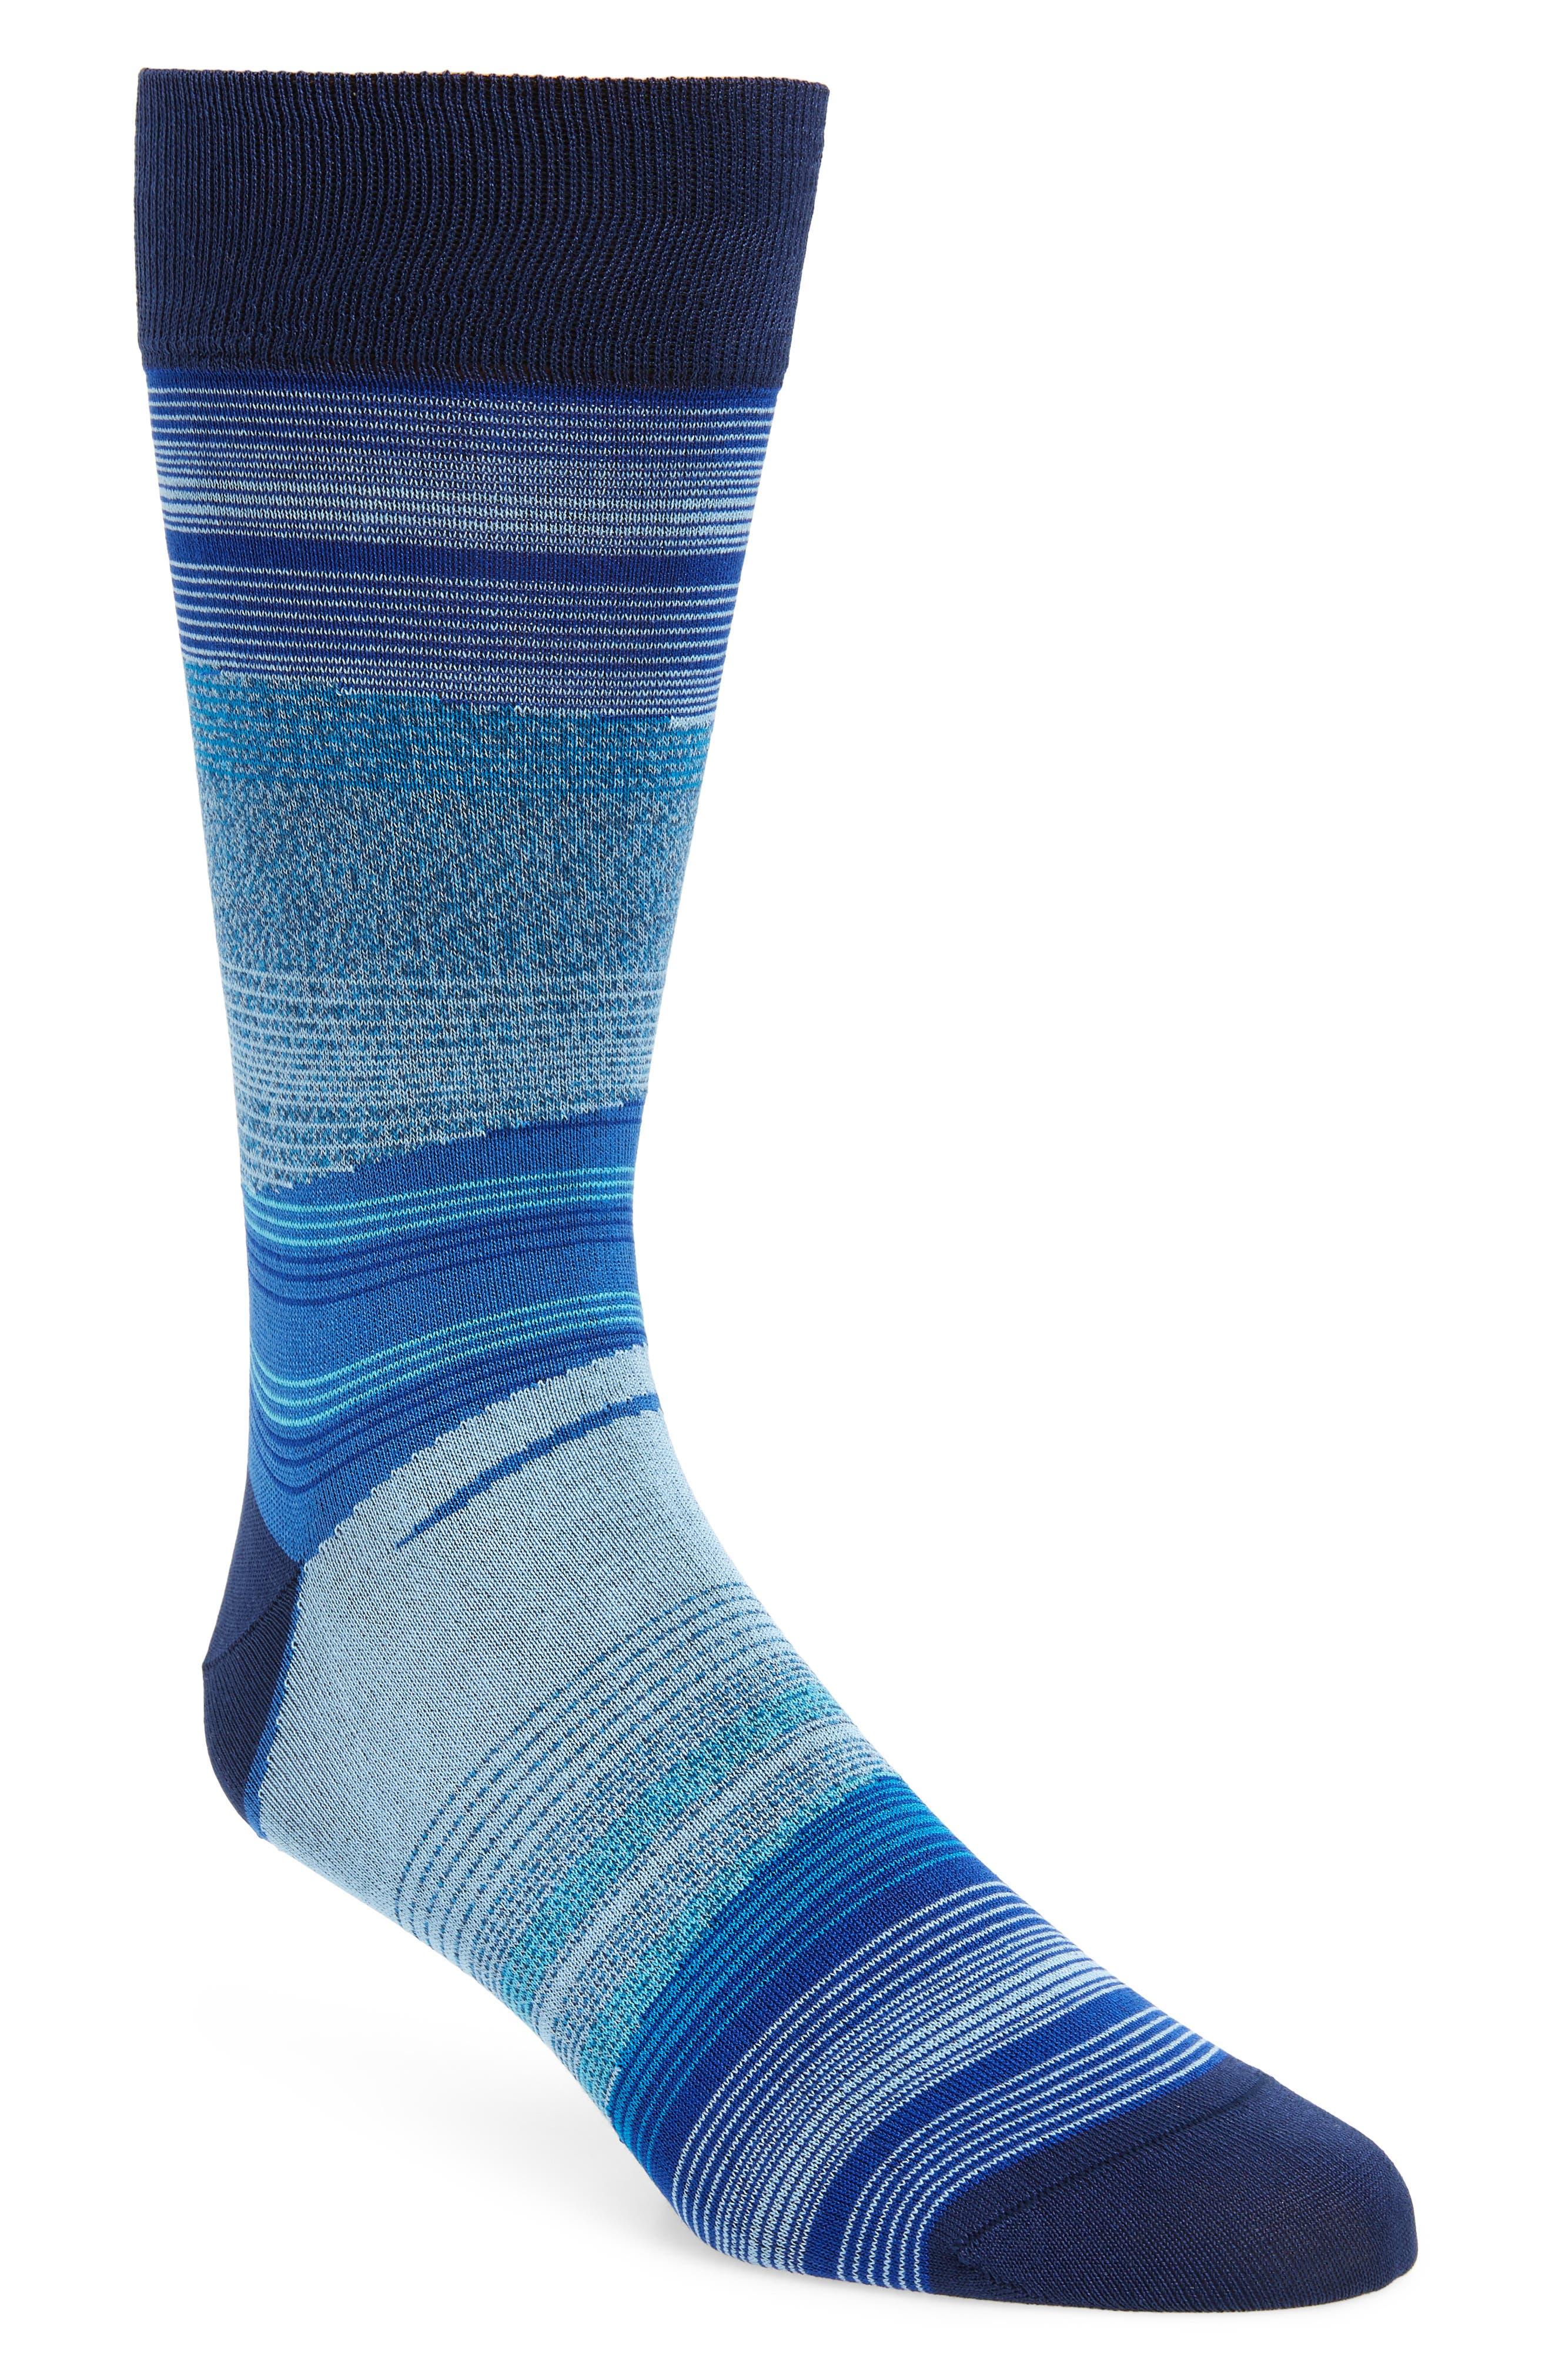 Stripe Socks,                             Main thumbnail 1, color,                             NAVY